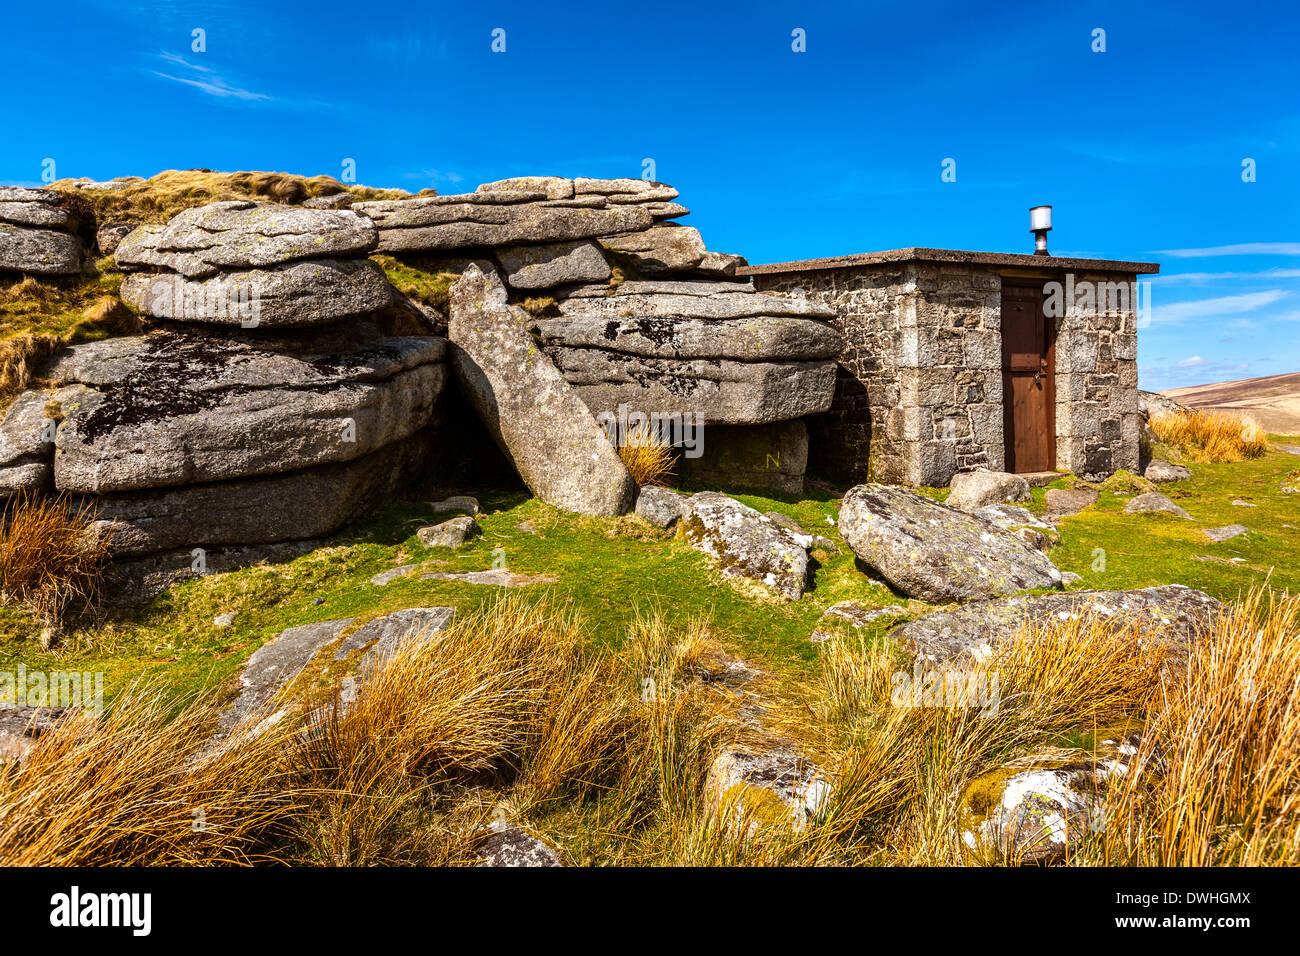 Oke Tor, Dartmoor National Park, Belstone, l'ouest du Devon, Angleterre, Royaume-Uni, Europe. Photo Stock